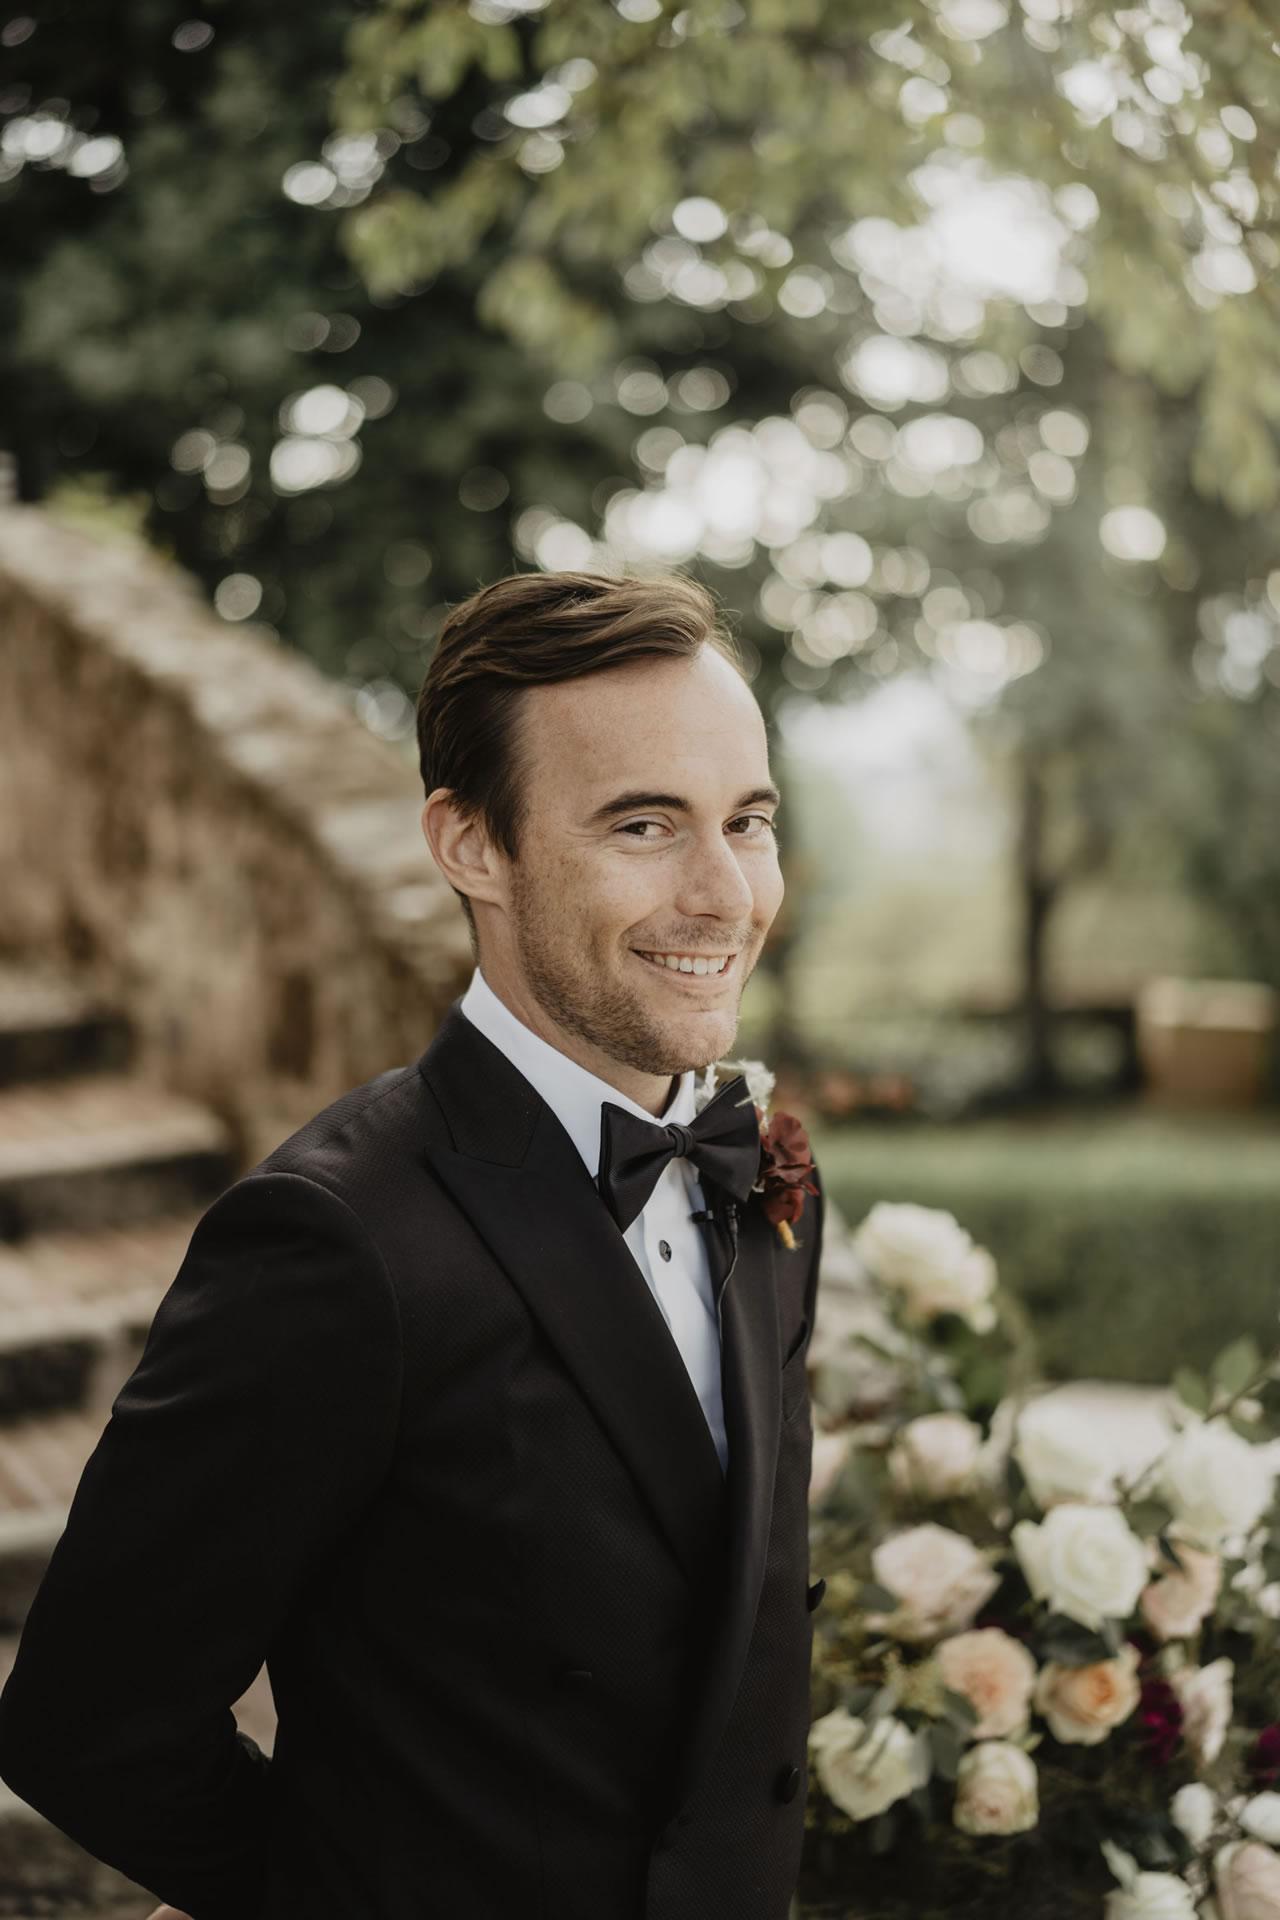 - 22 :: A bride's smile (Wedding in Tuscany) :: Luxury wedding photography - 21 ::  - 22